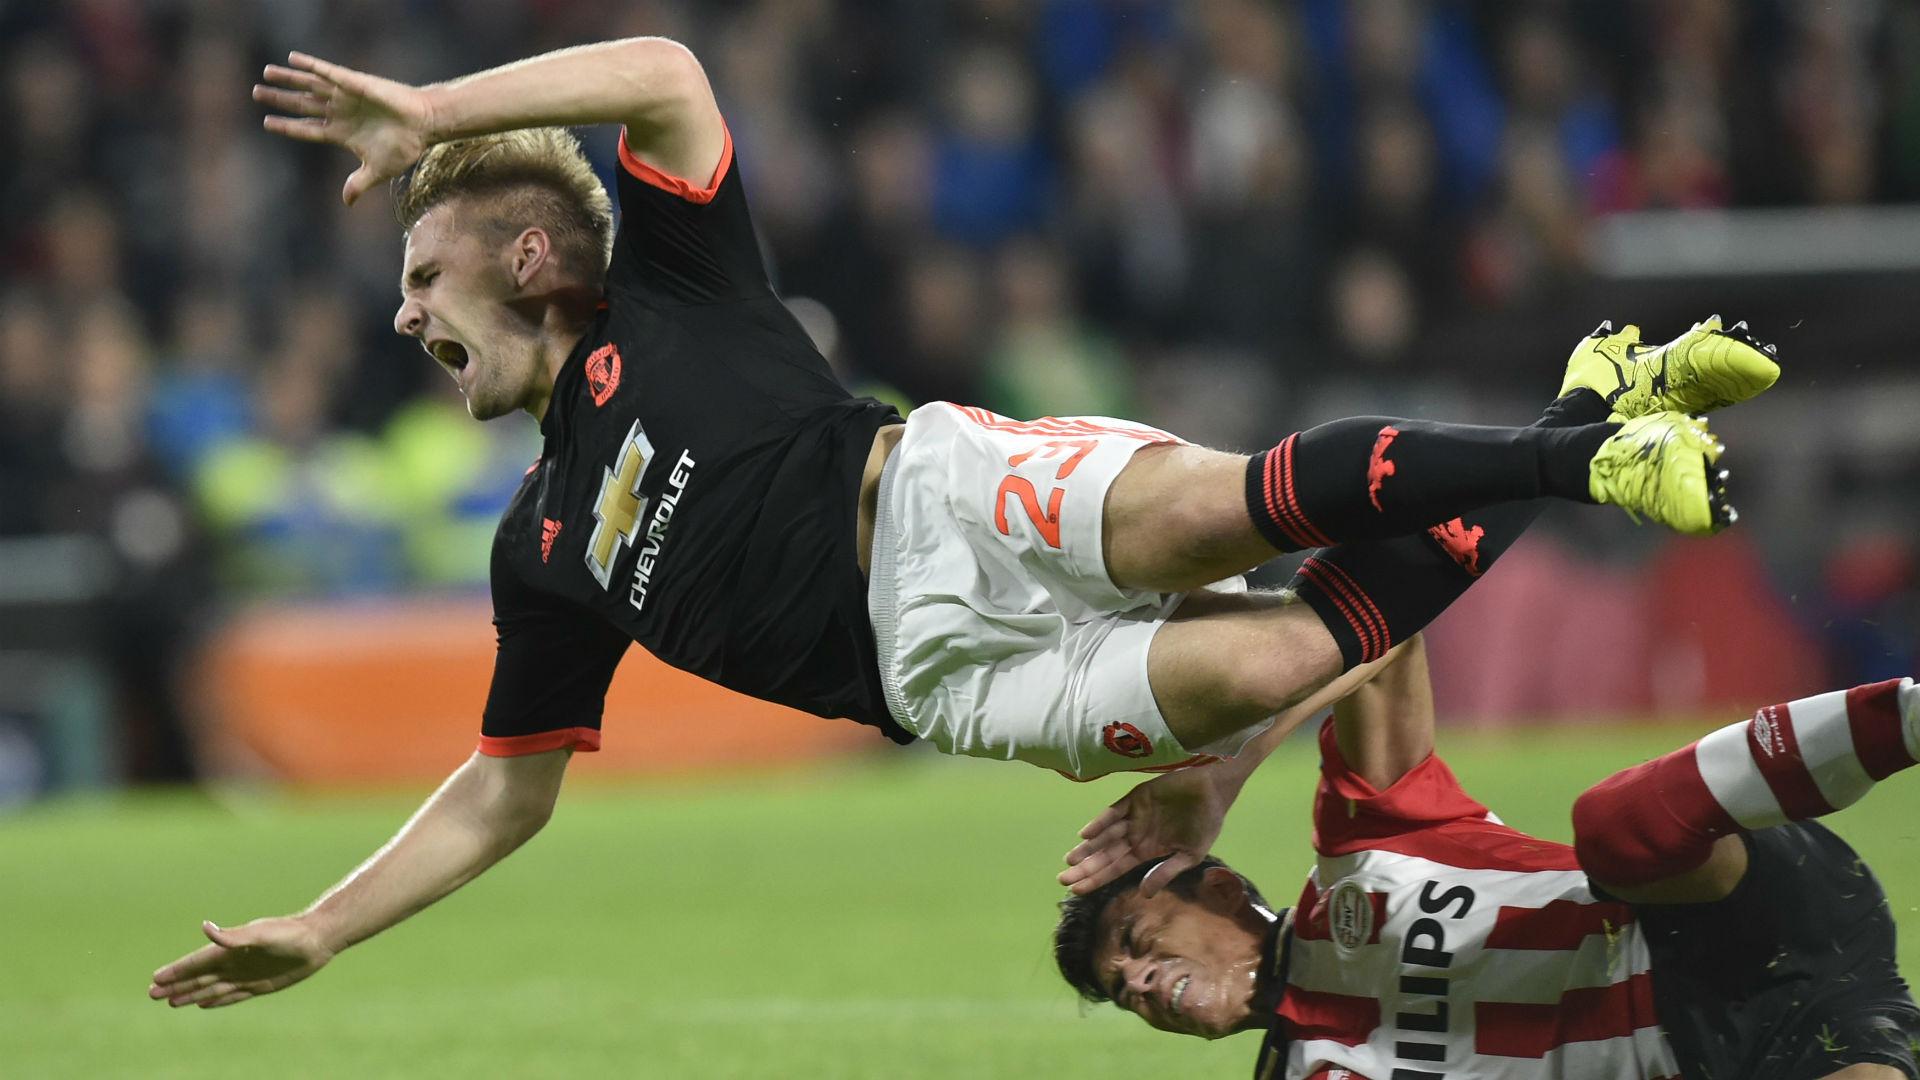 Berita Manchester United Luke Shaw Saya Nyaris Kehilangan